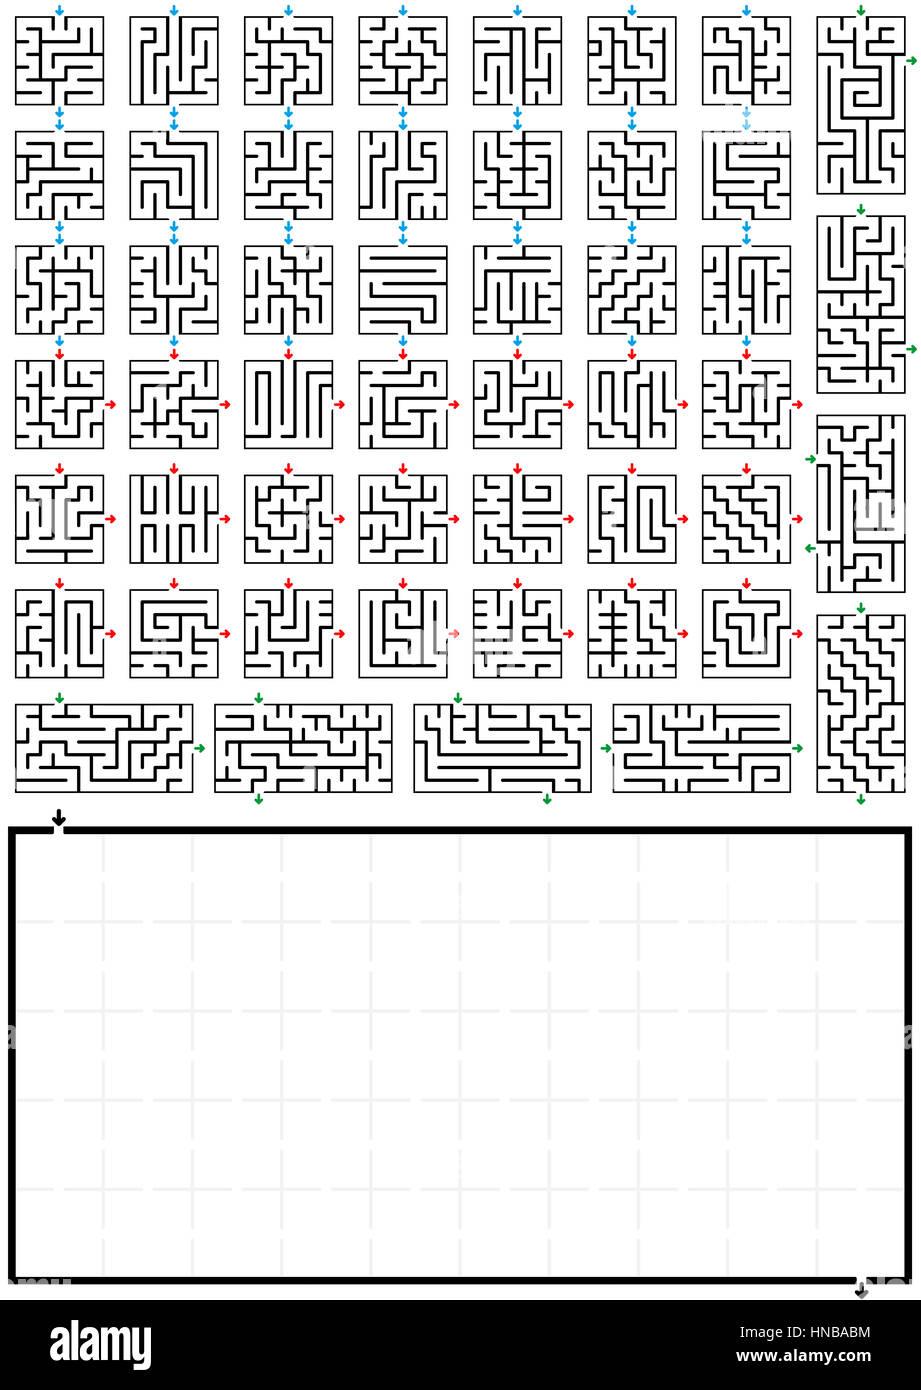 Net Maze Stock Photos & Net Maze Stock Images - Alamy